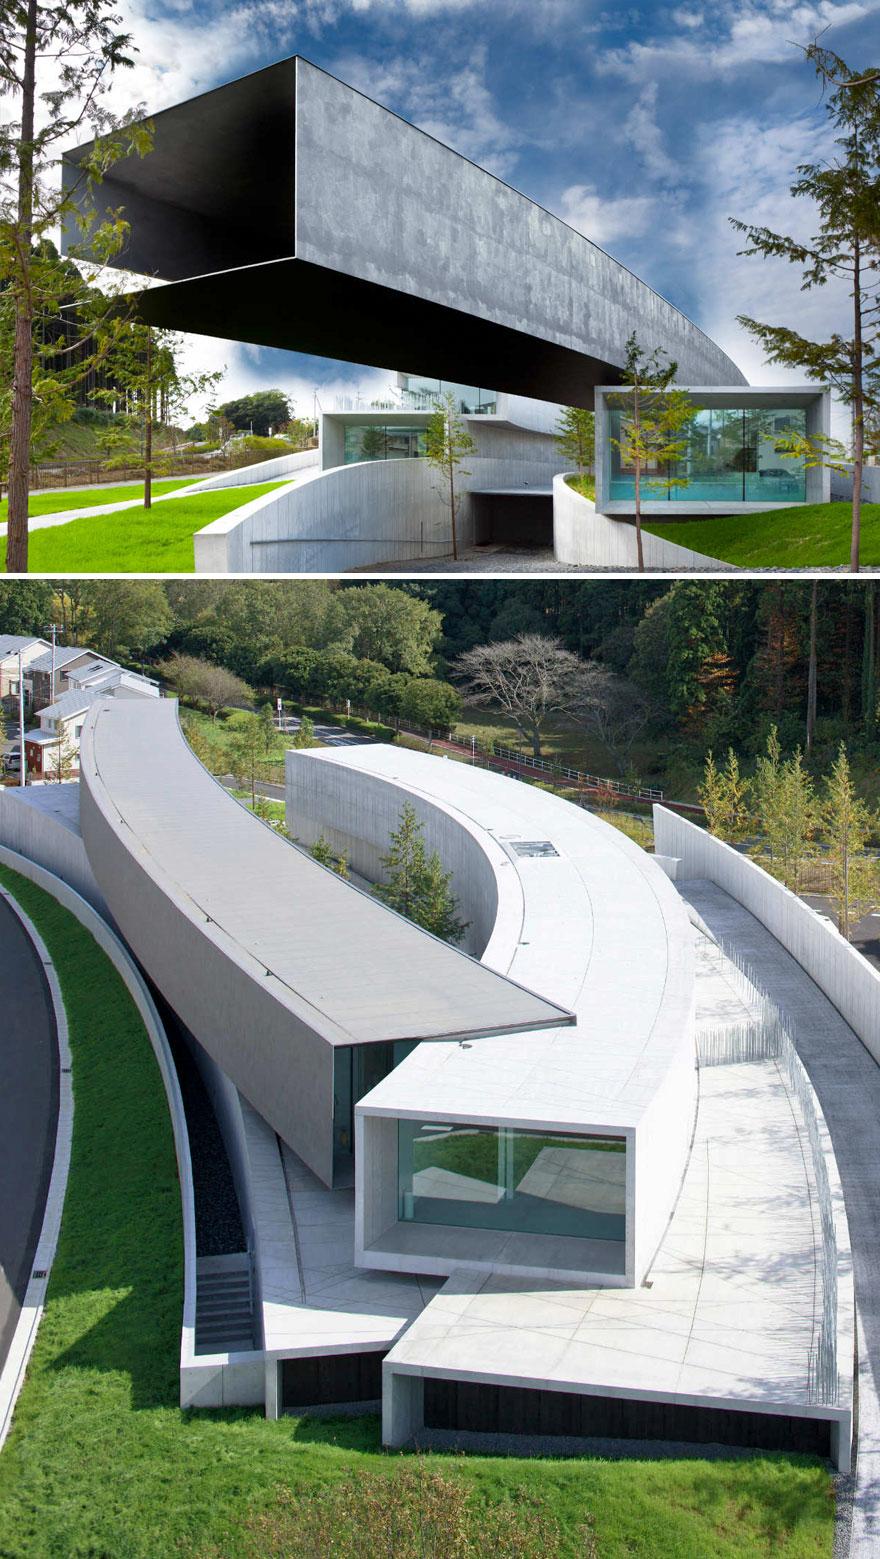 Hoki Museum In Midori Ward, Chiba, Japan